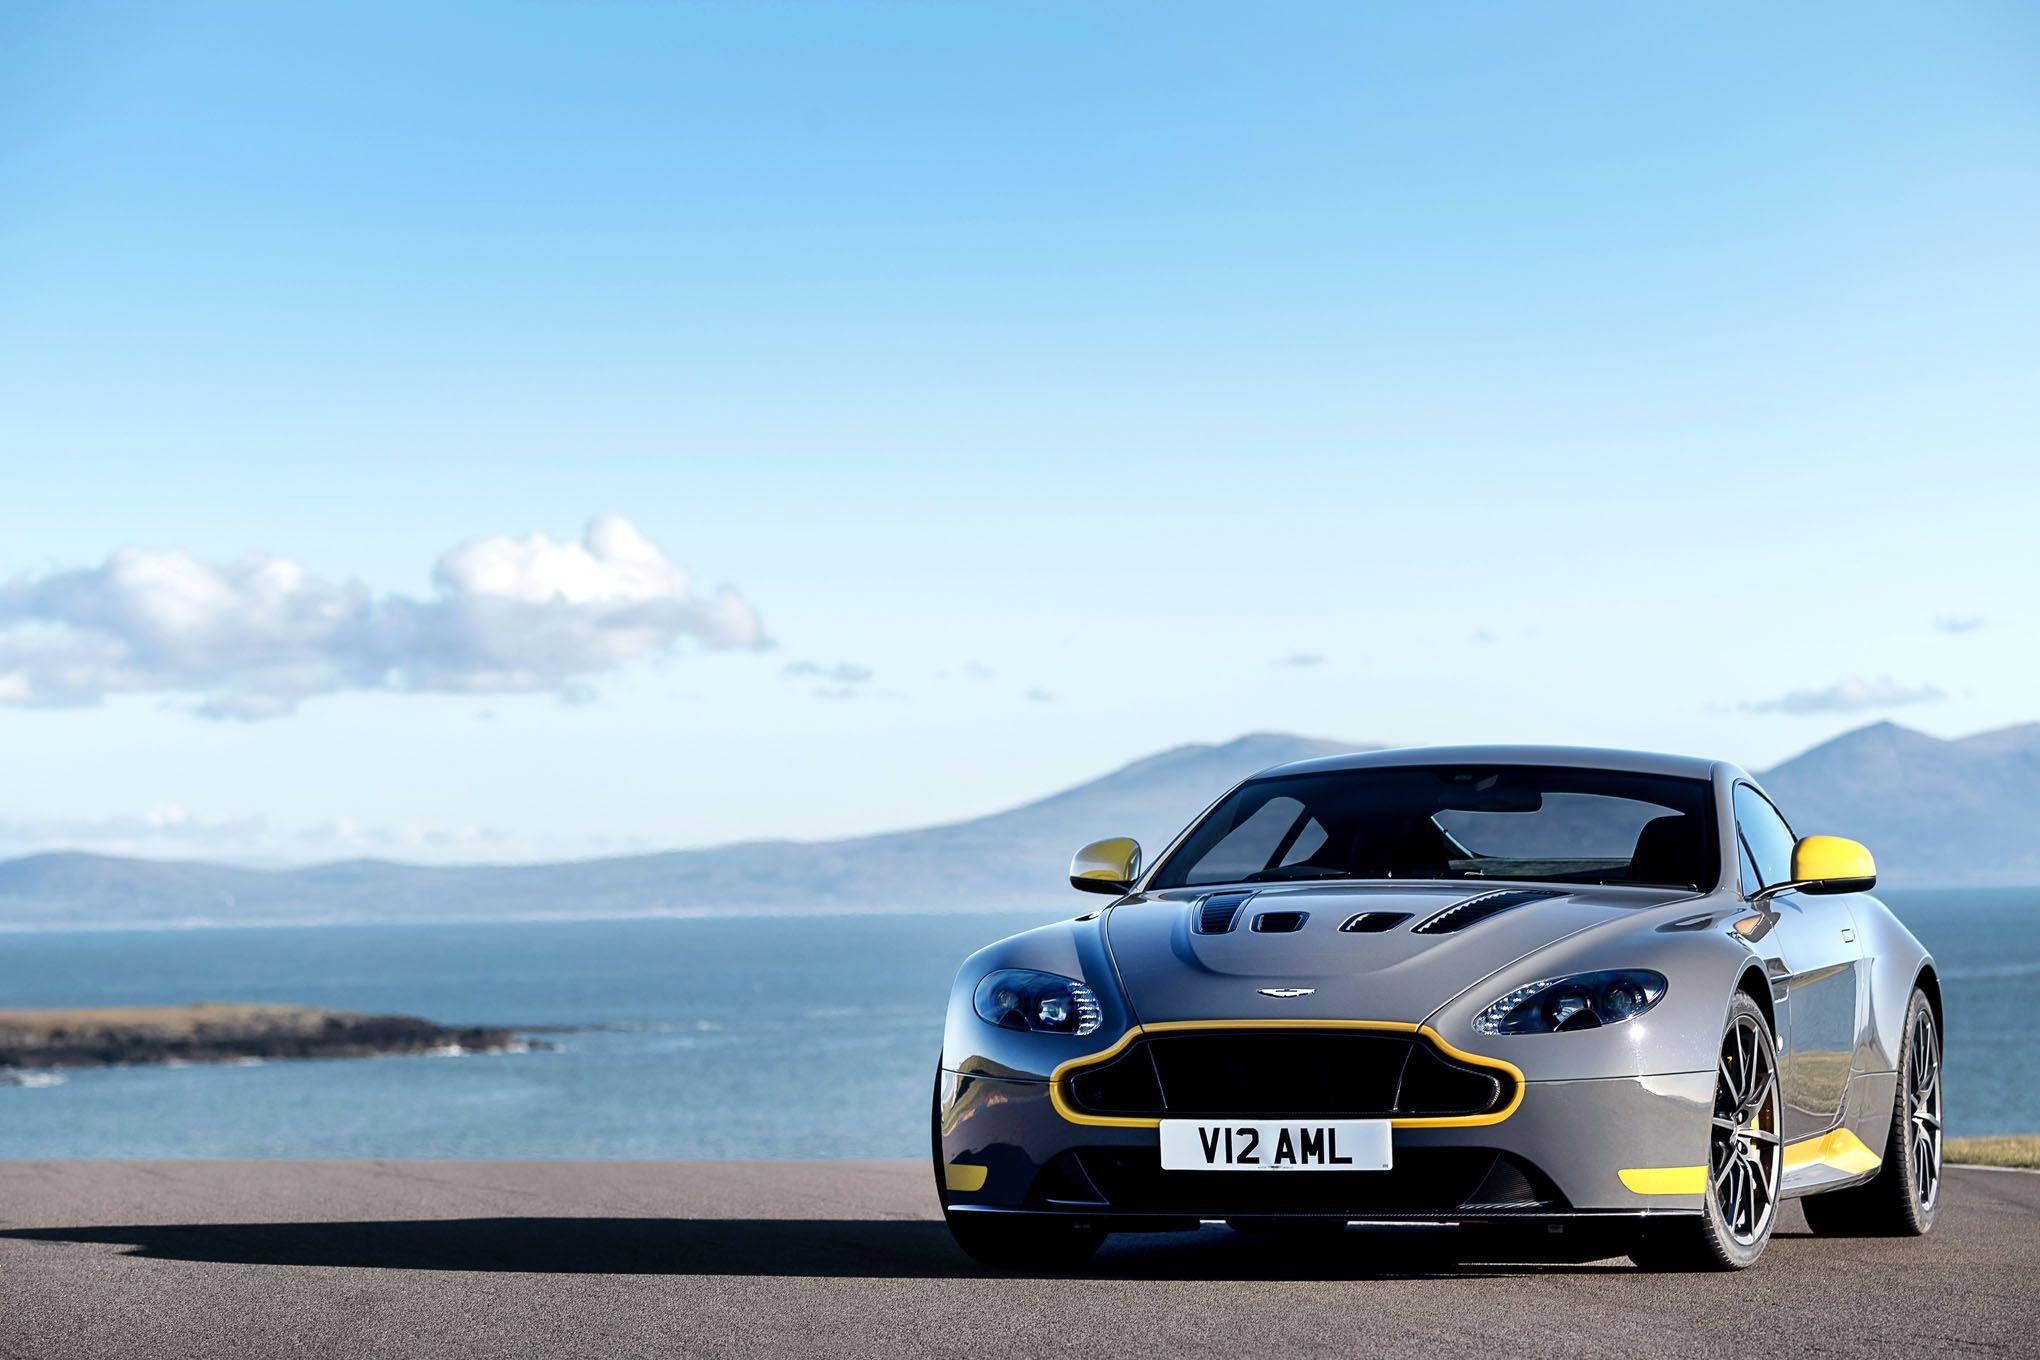 Image For 2017 Aston Martin V12 Vantage S Nexus 5 Wallpaper Nice Look